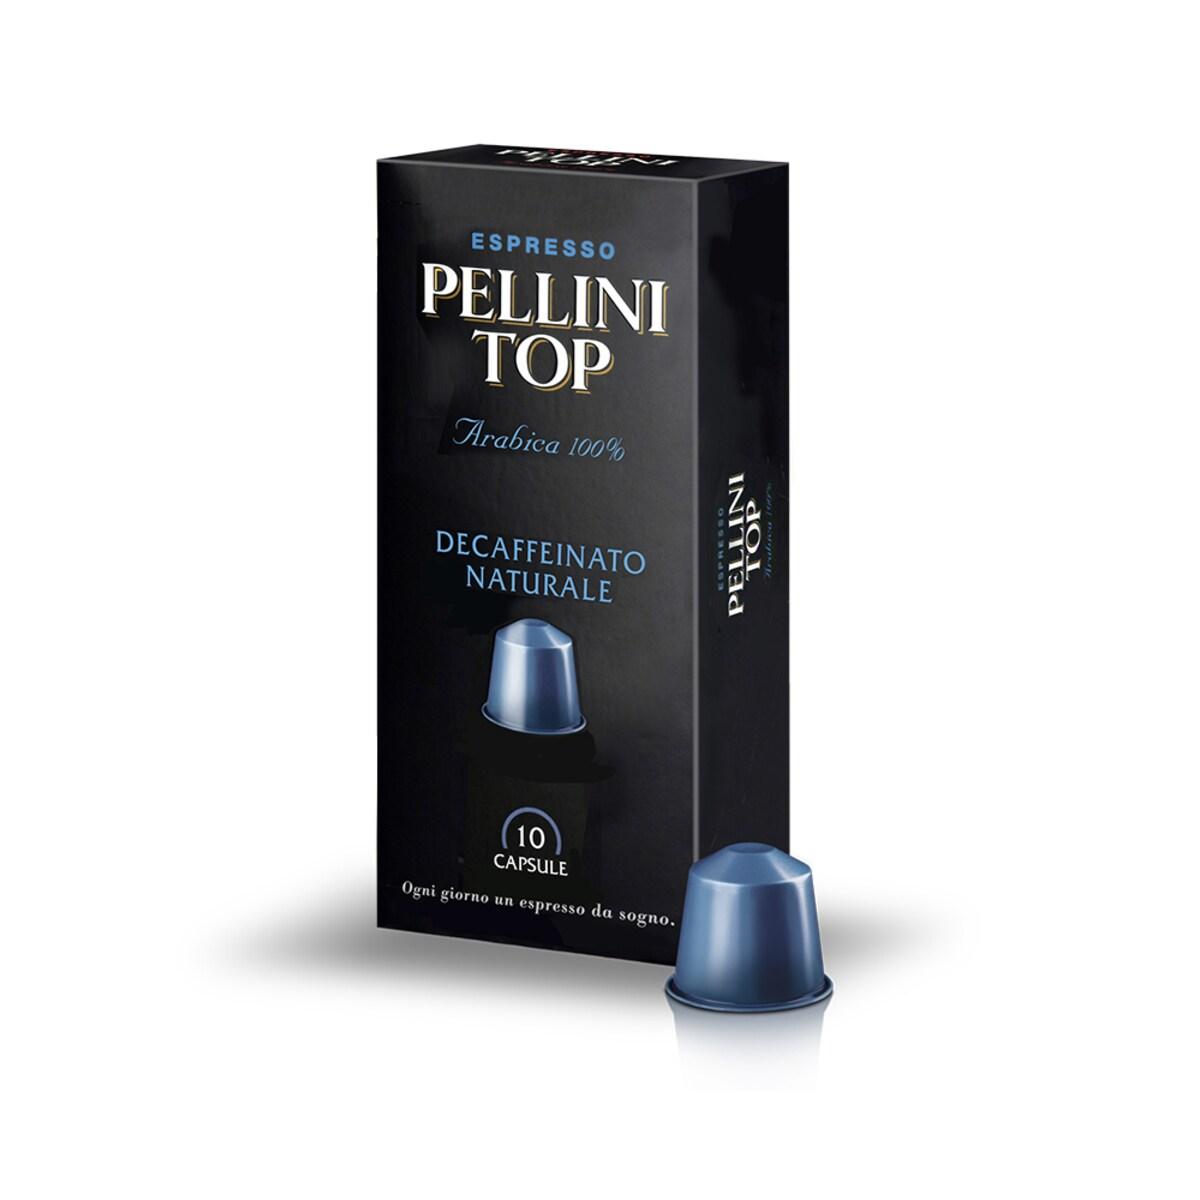 Pellini Top Decaffeinato Nespresso съвместими капсули 10бр